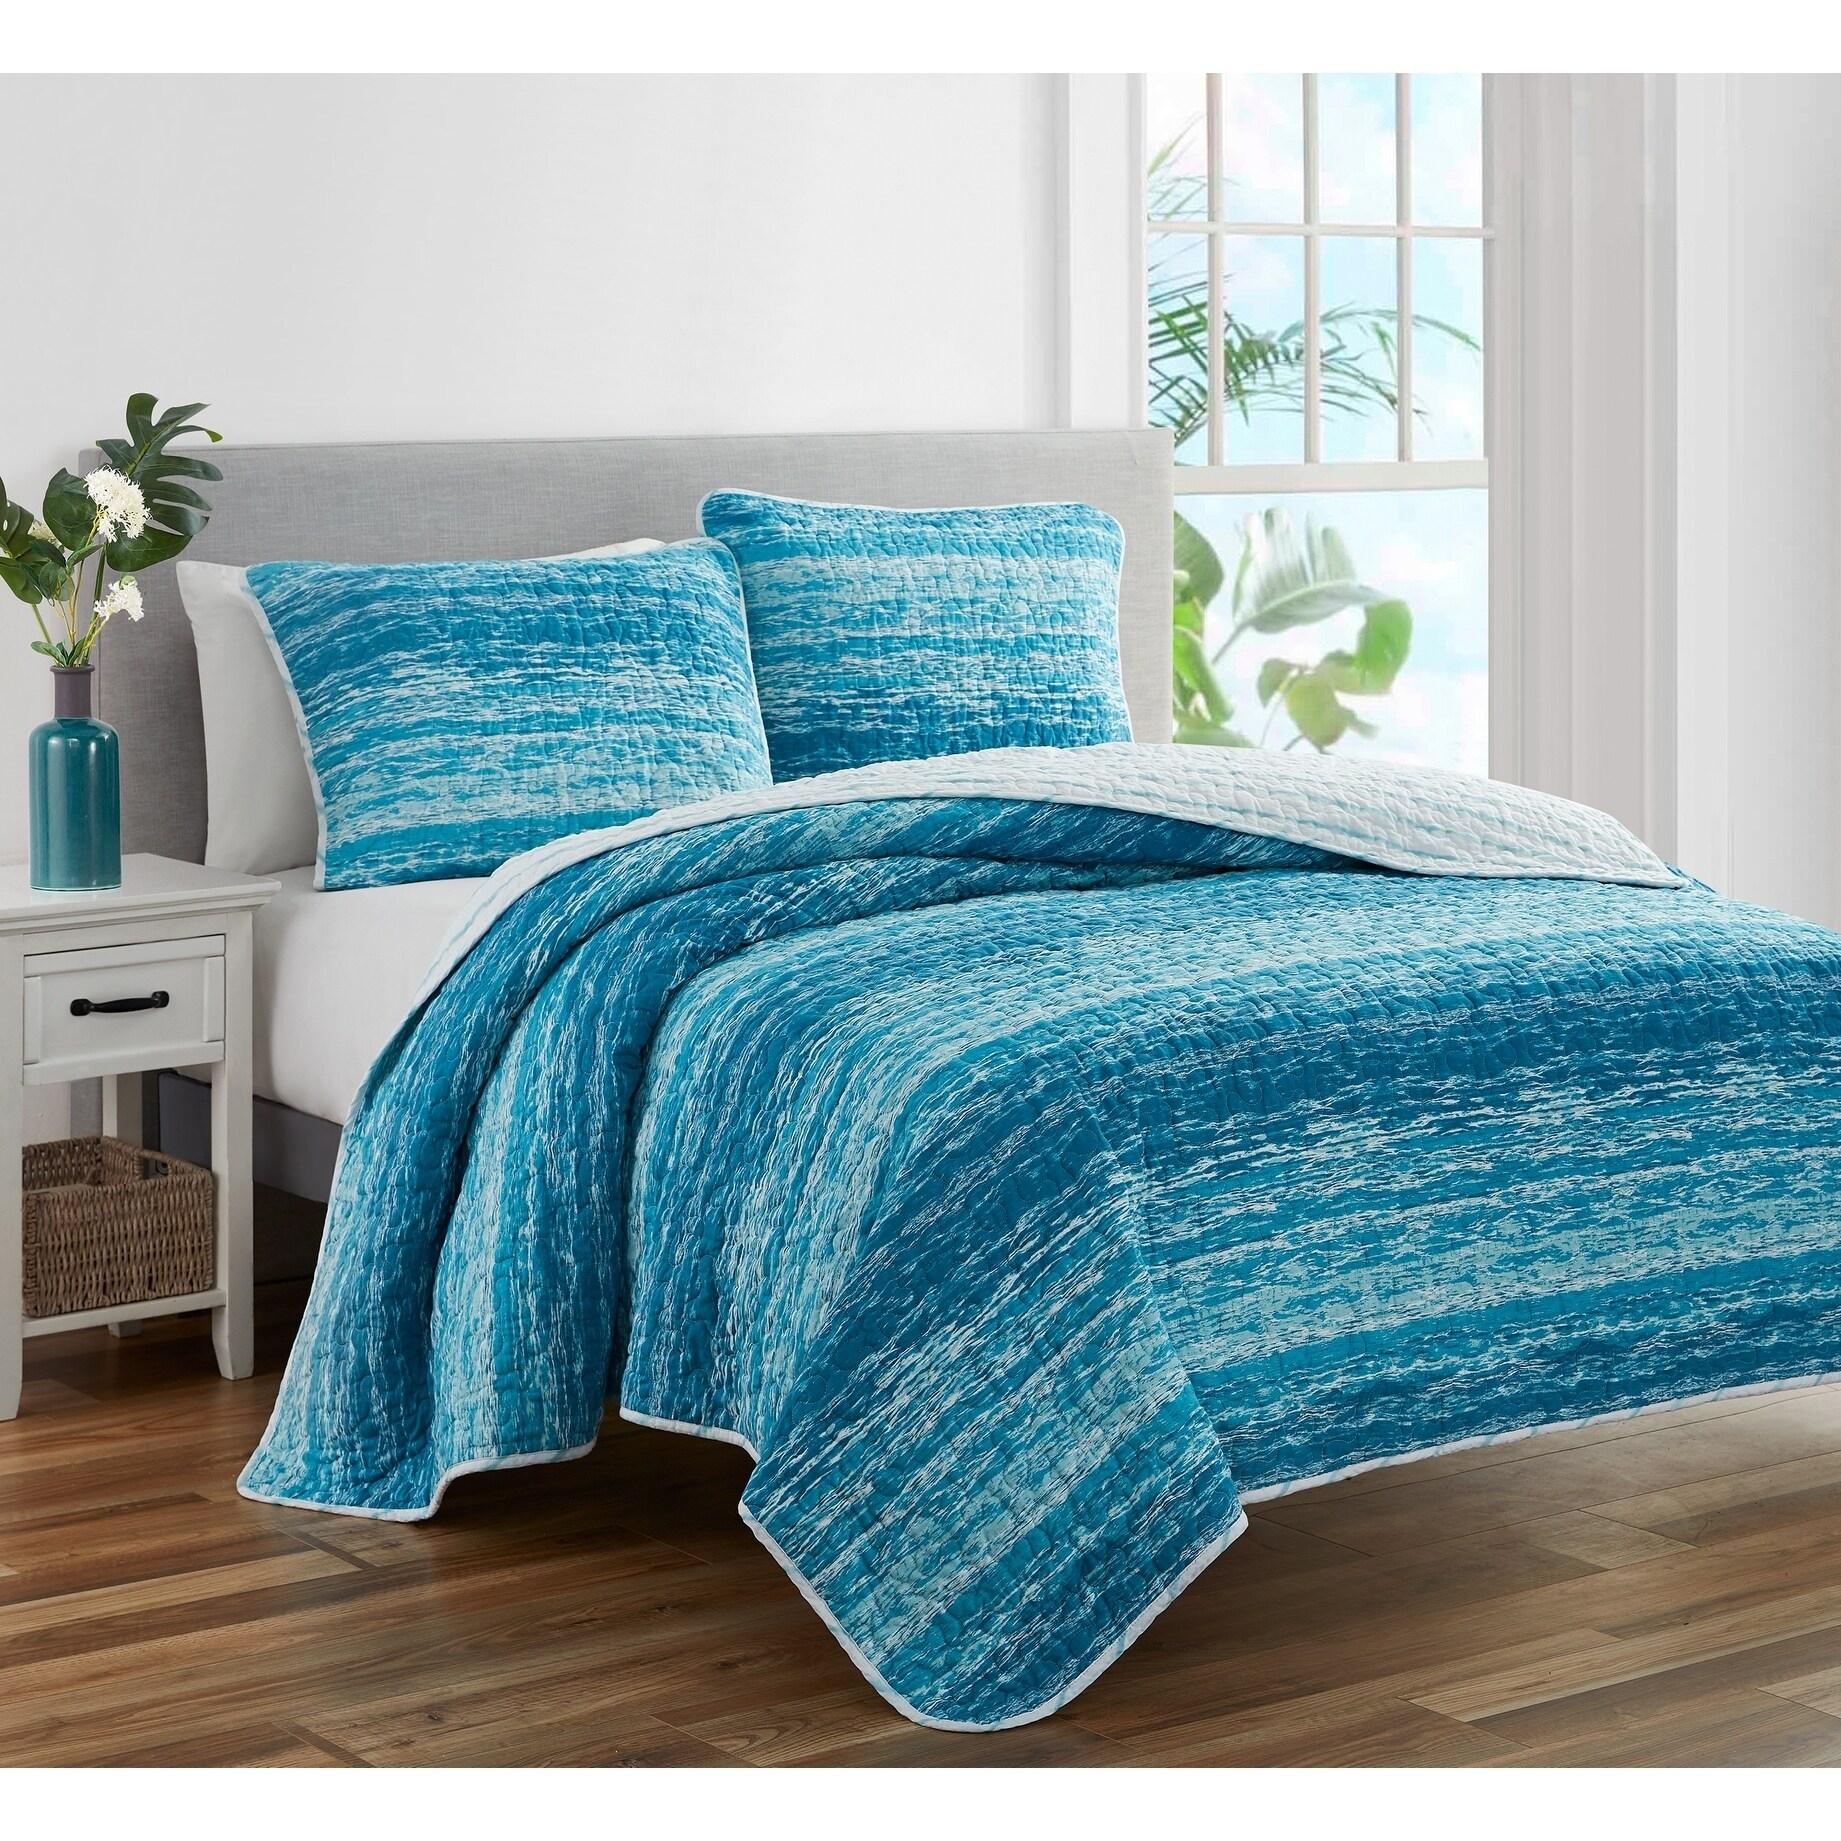 Ocean Stripe Coastal Blue 3 Piece Prewashed Reversible Quilt Set On Sale Overstock 28997523